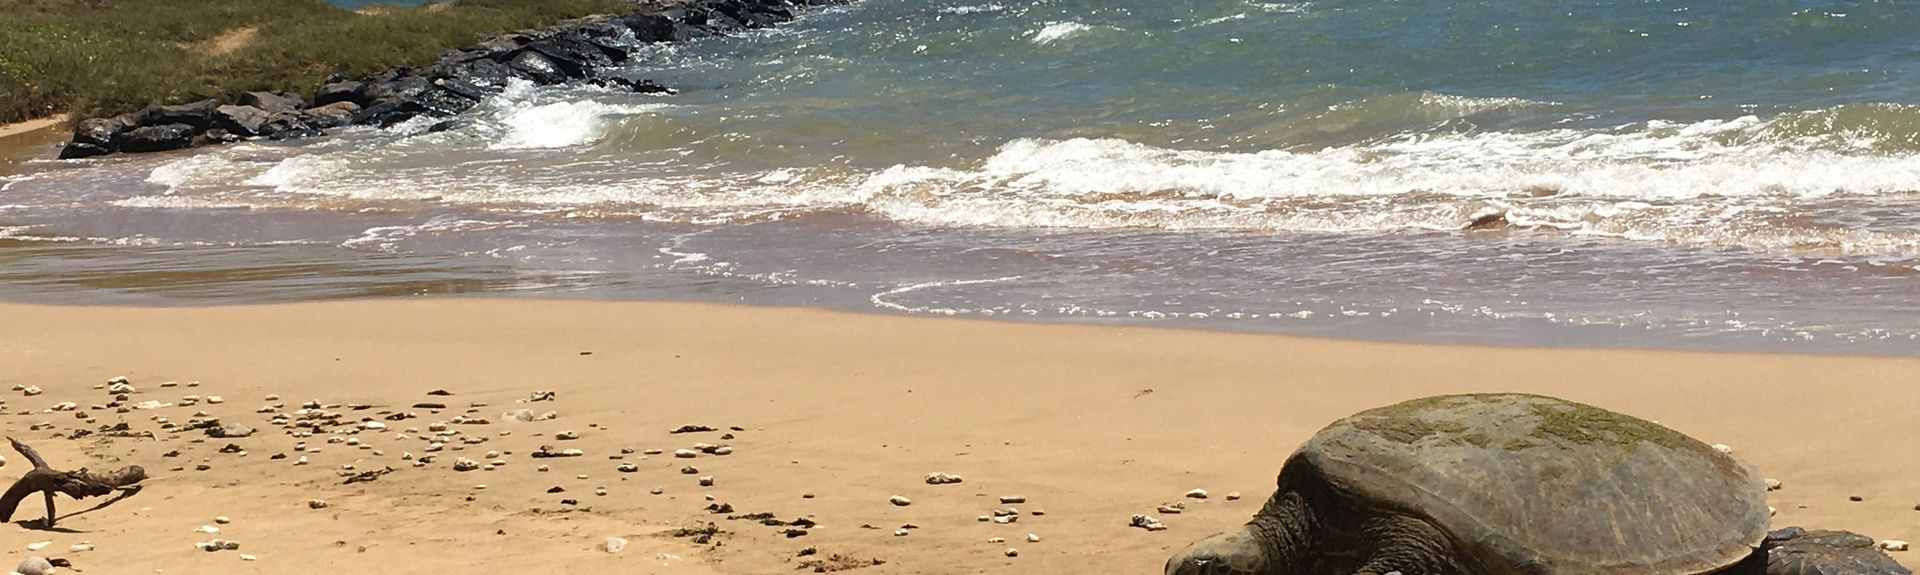 Waiohuli Beach Hale, Kihei, HI, USA